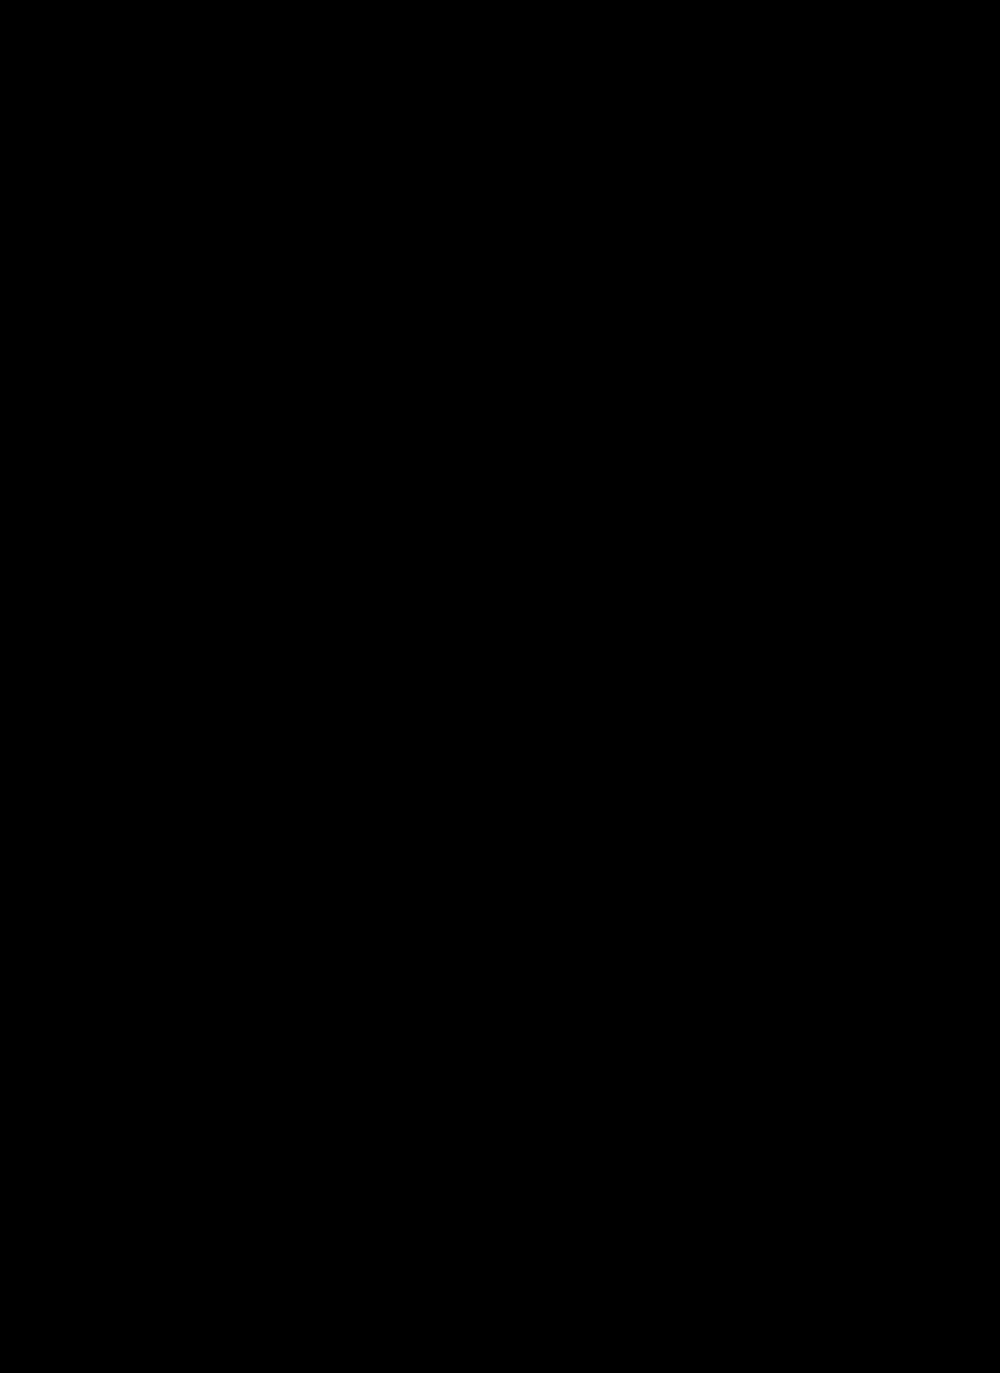 Trademark Guidelines Sxsw Logo Guidelines Sxsw Promotional Image